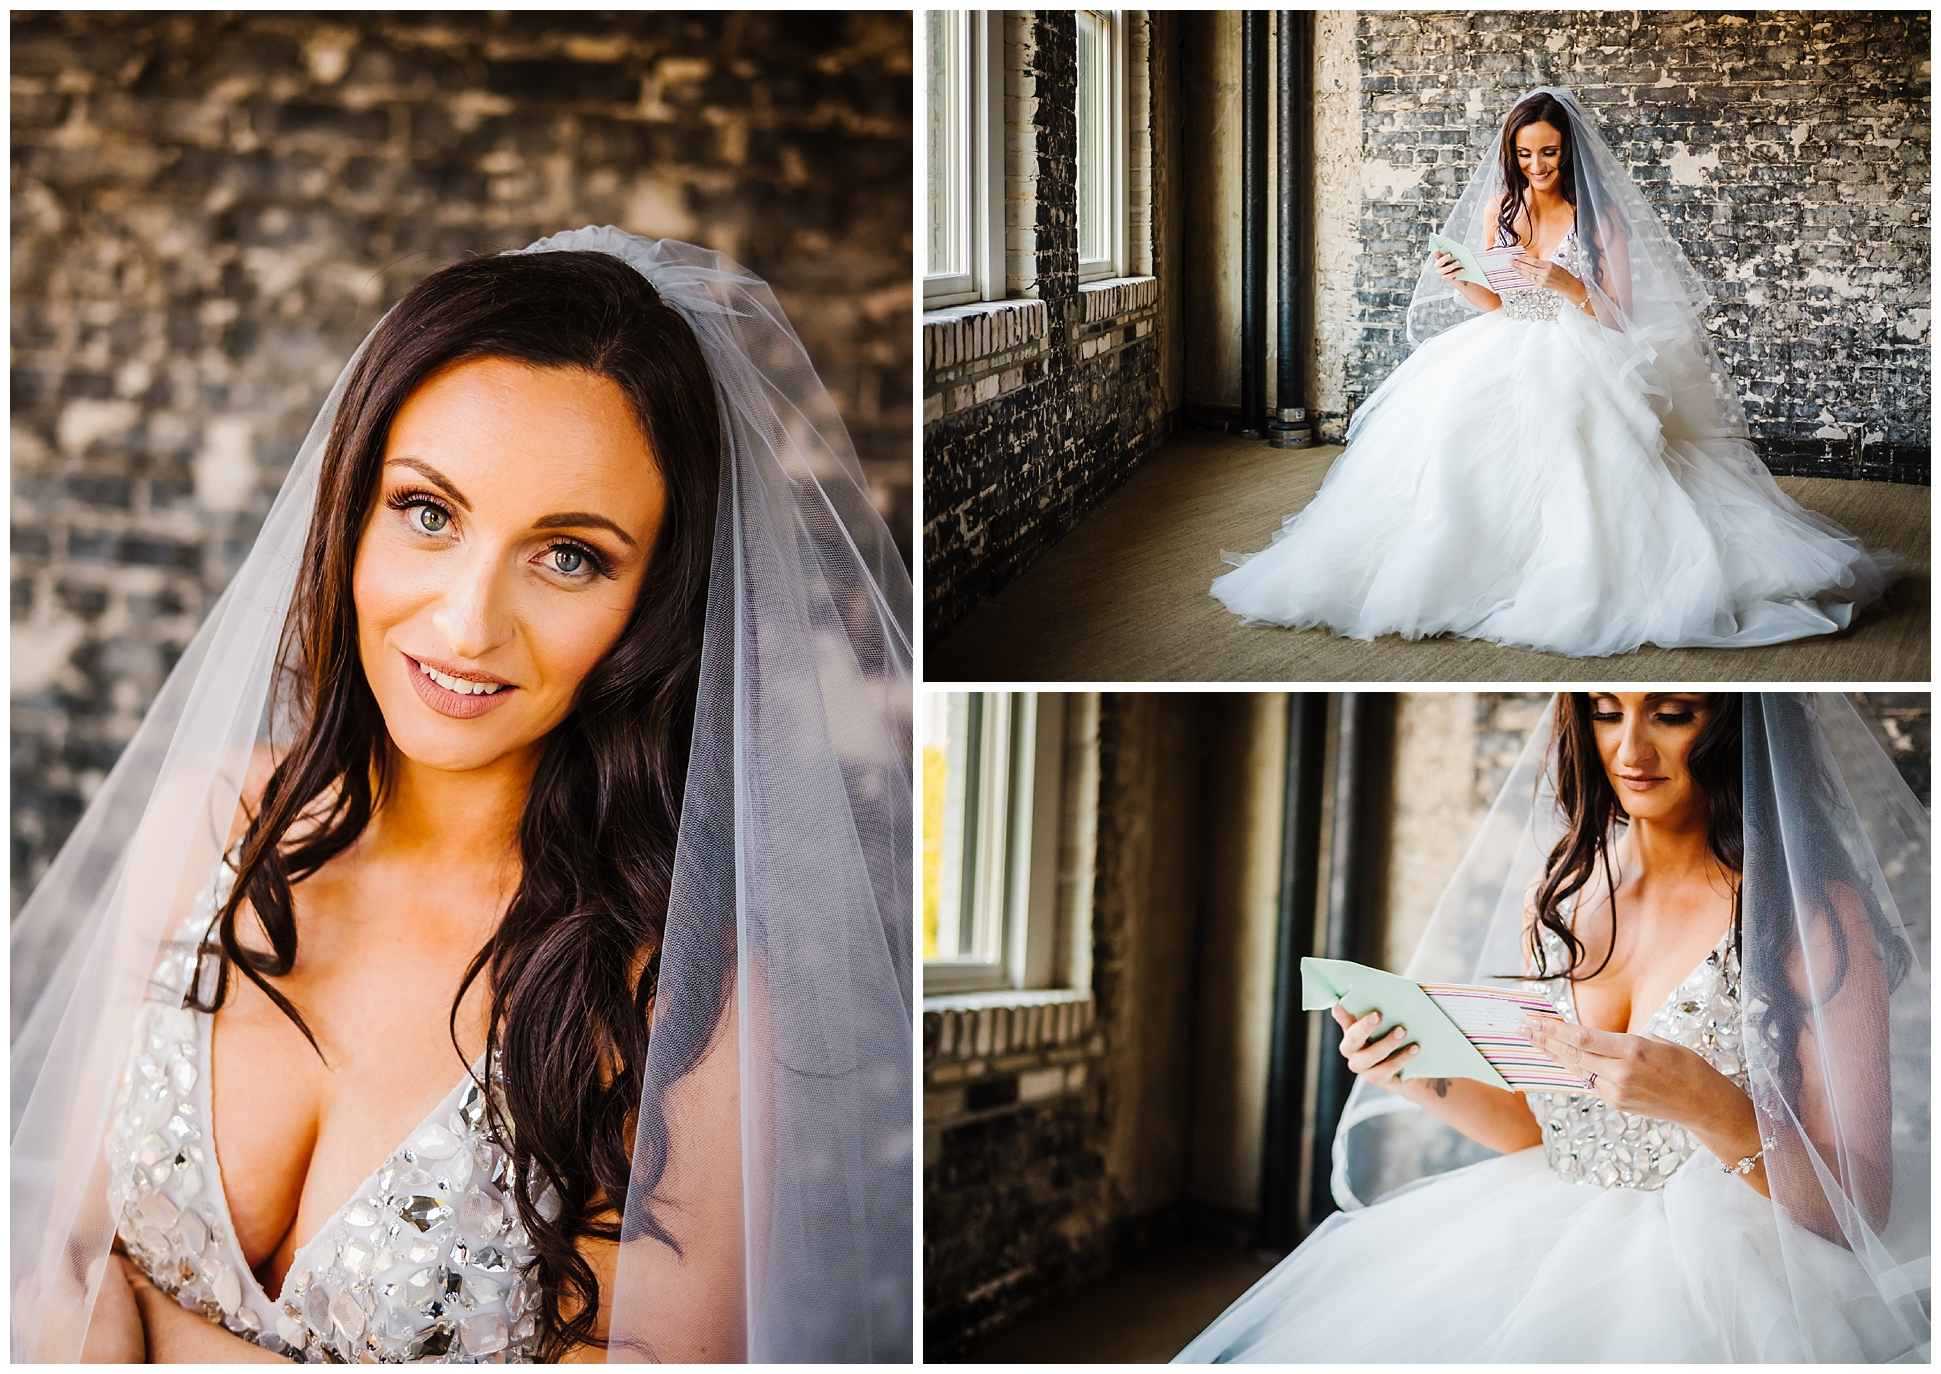 tampa-wedding-photographer-oxford-exchange-garland-candlelight-gold-hayley-paige_0014.jpg